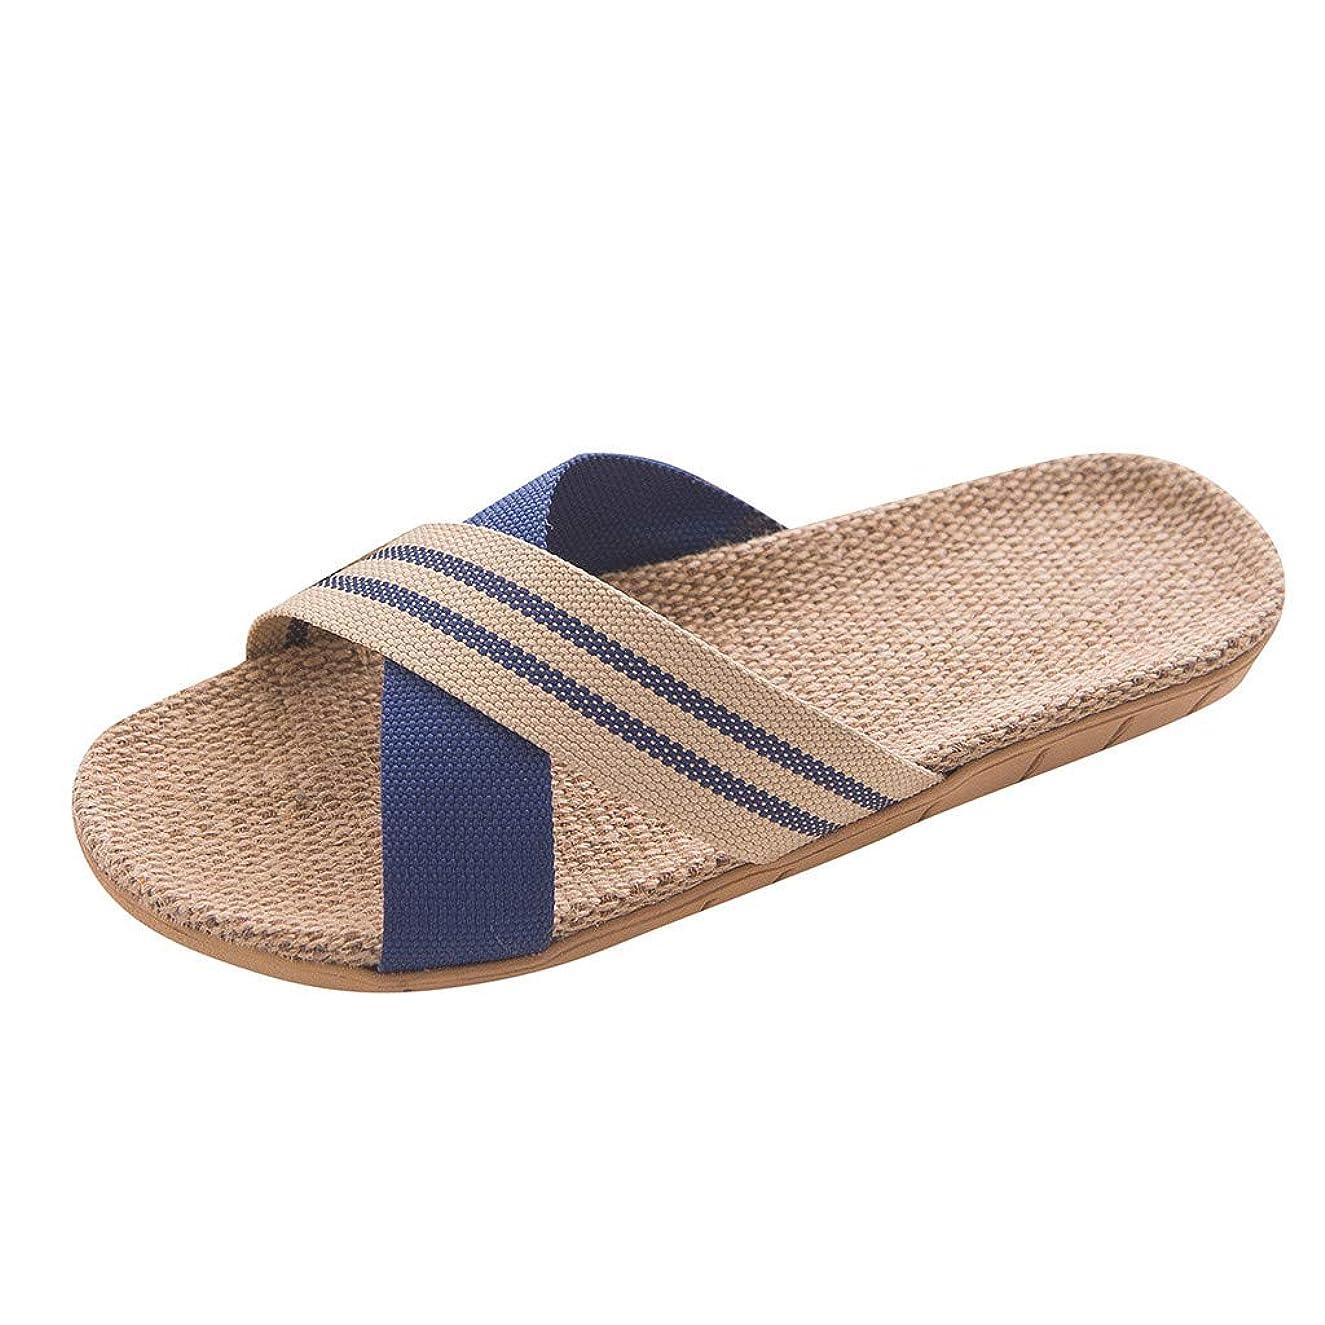 Shower Sandal Slippers Men Quick Drying Bathroom Slippers Gym Slippers Soft Sole Open Toe House Slippers